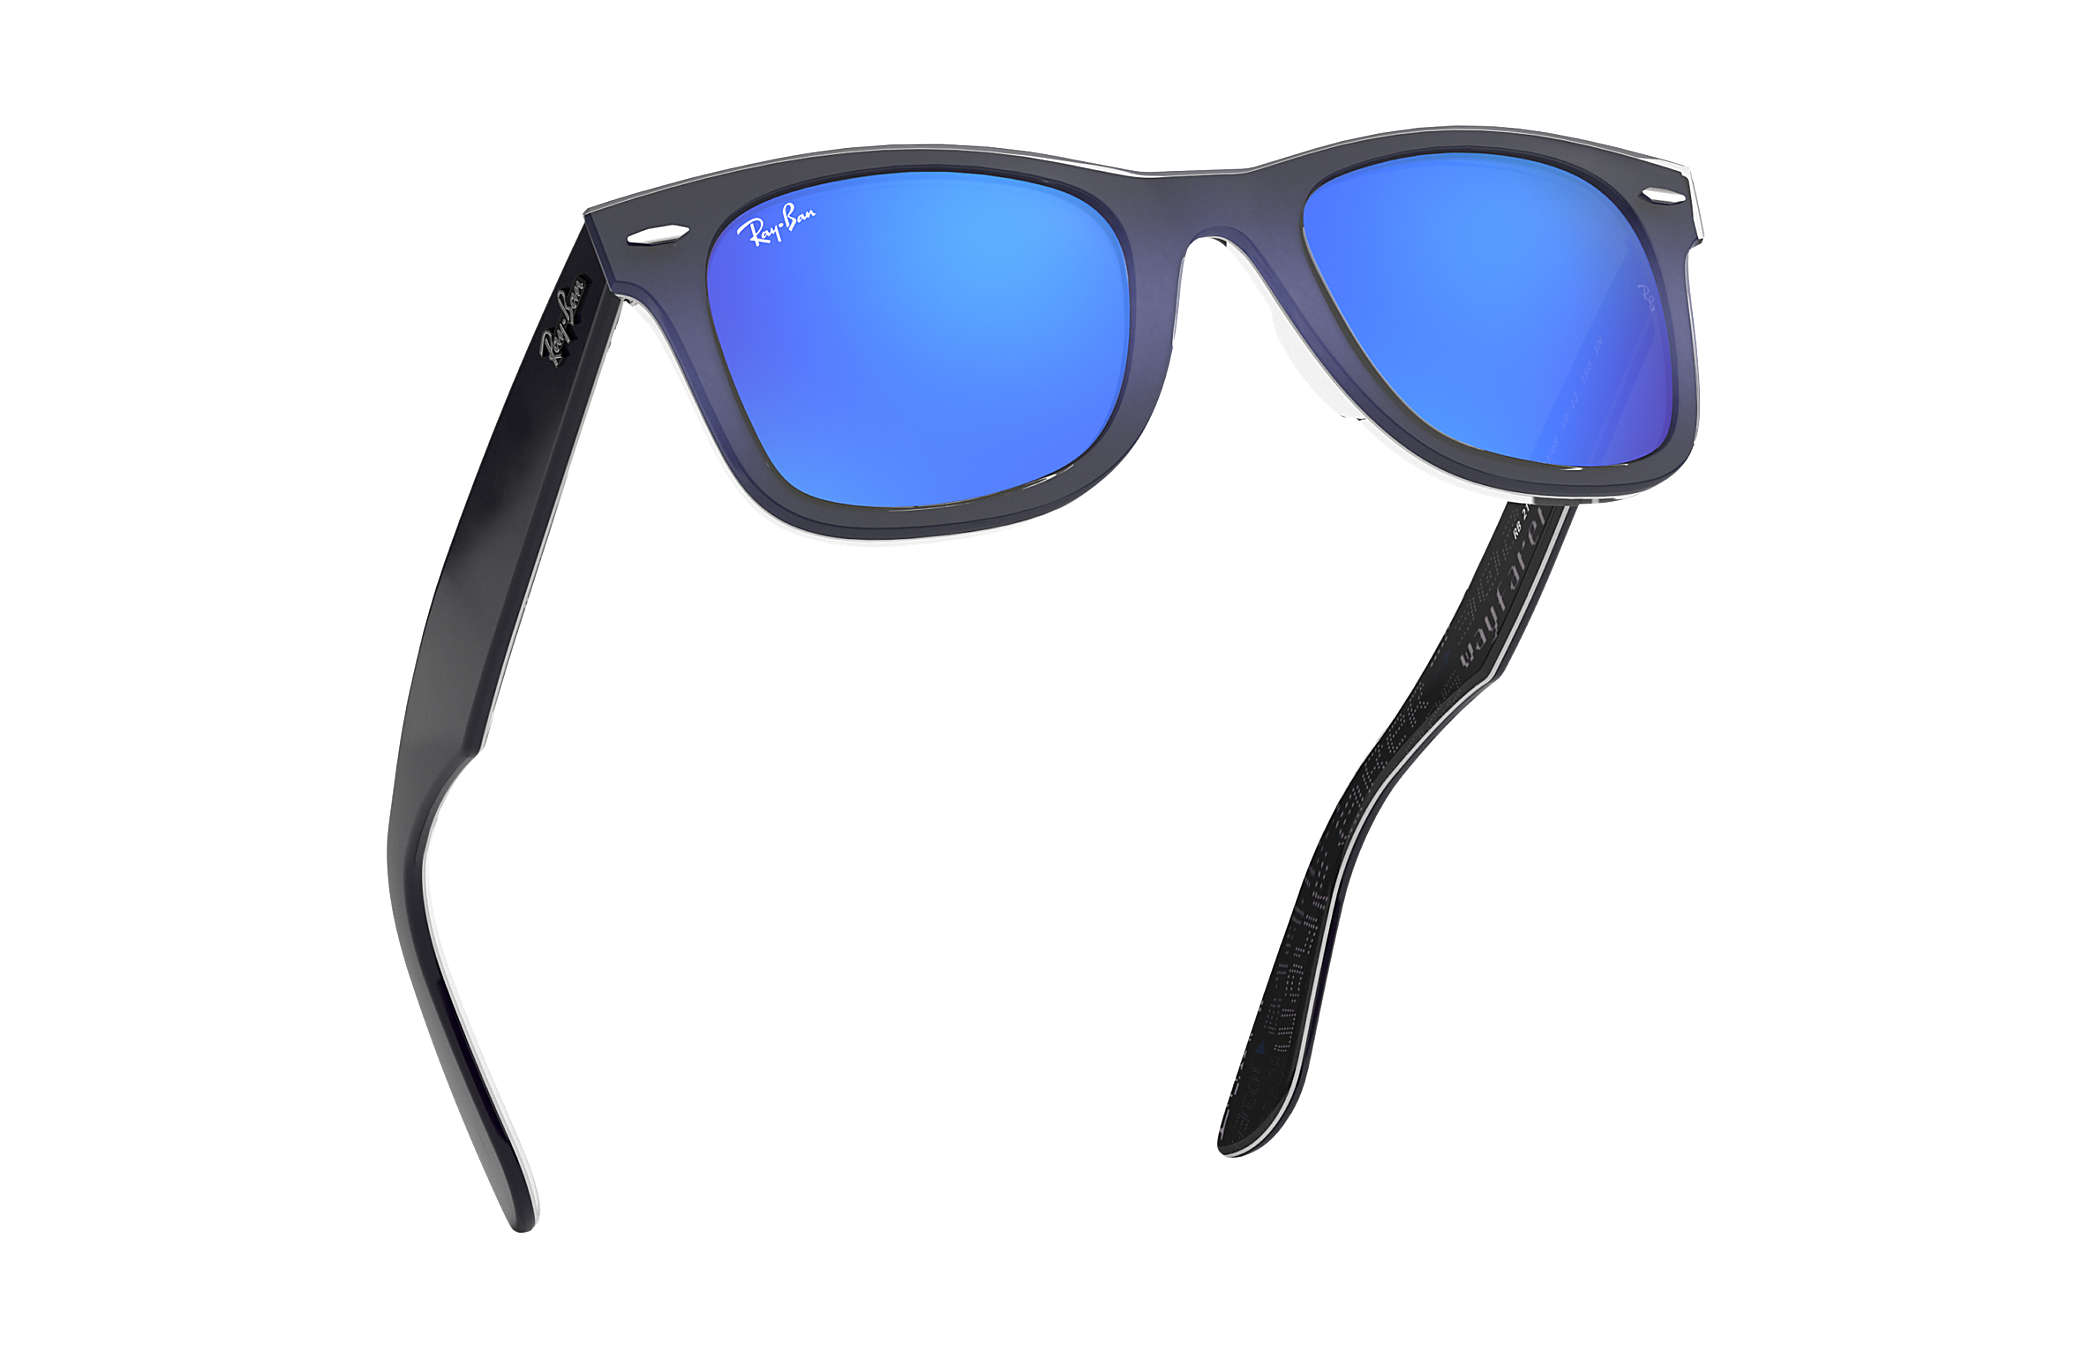 ray ban wayfarer braun blau